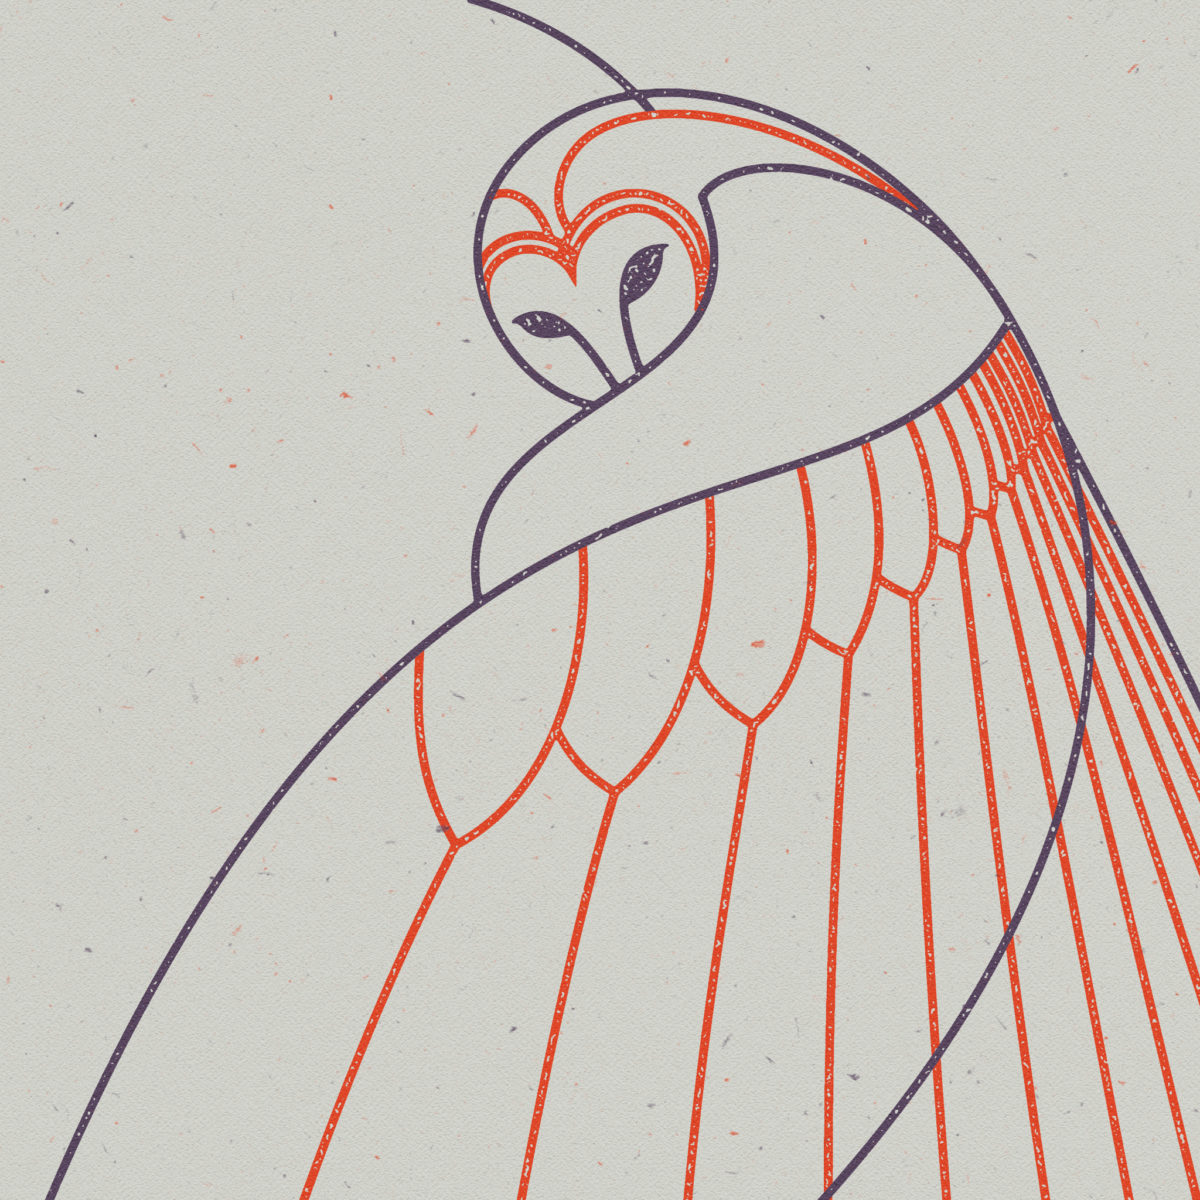 Animal Studies: Tawny Owl